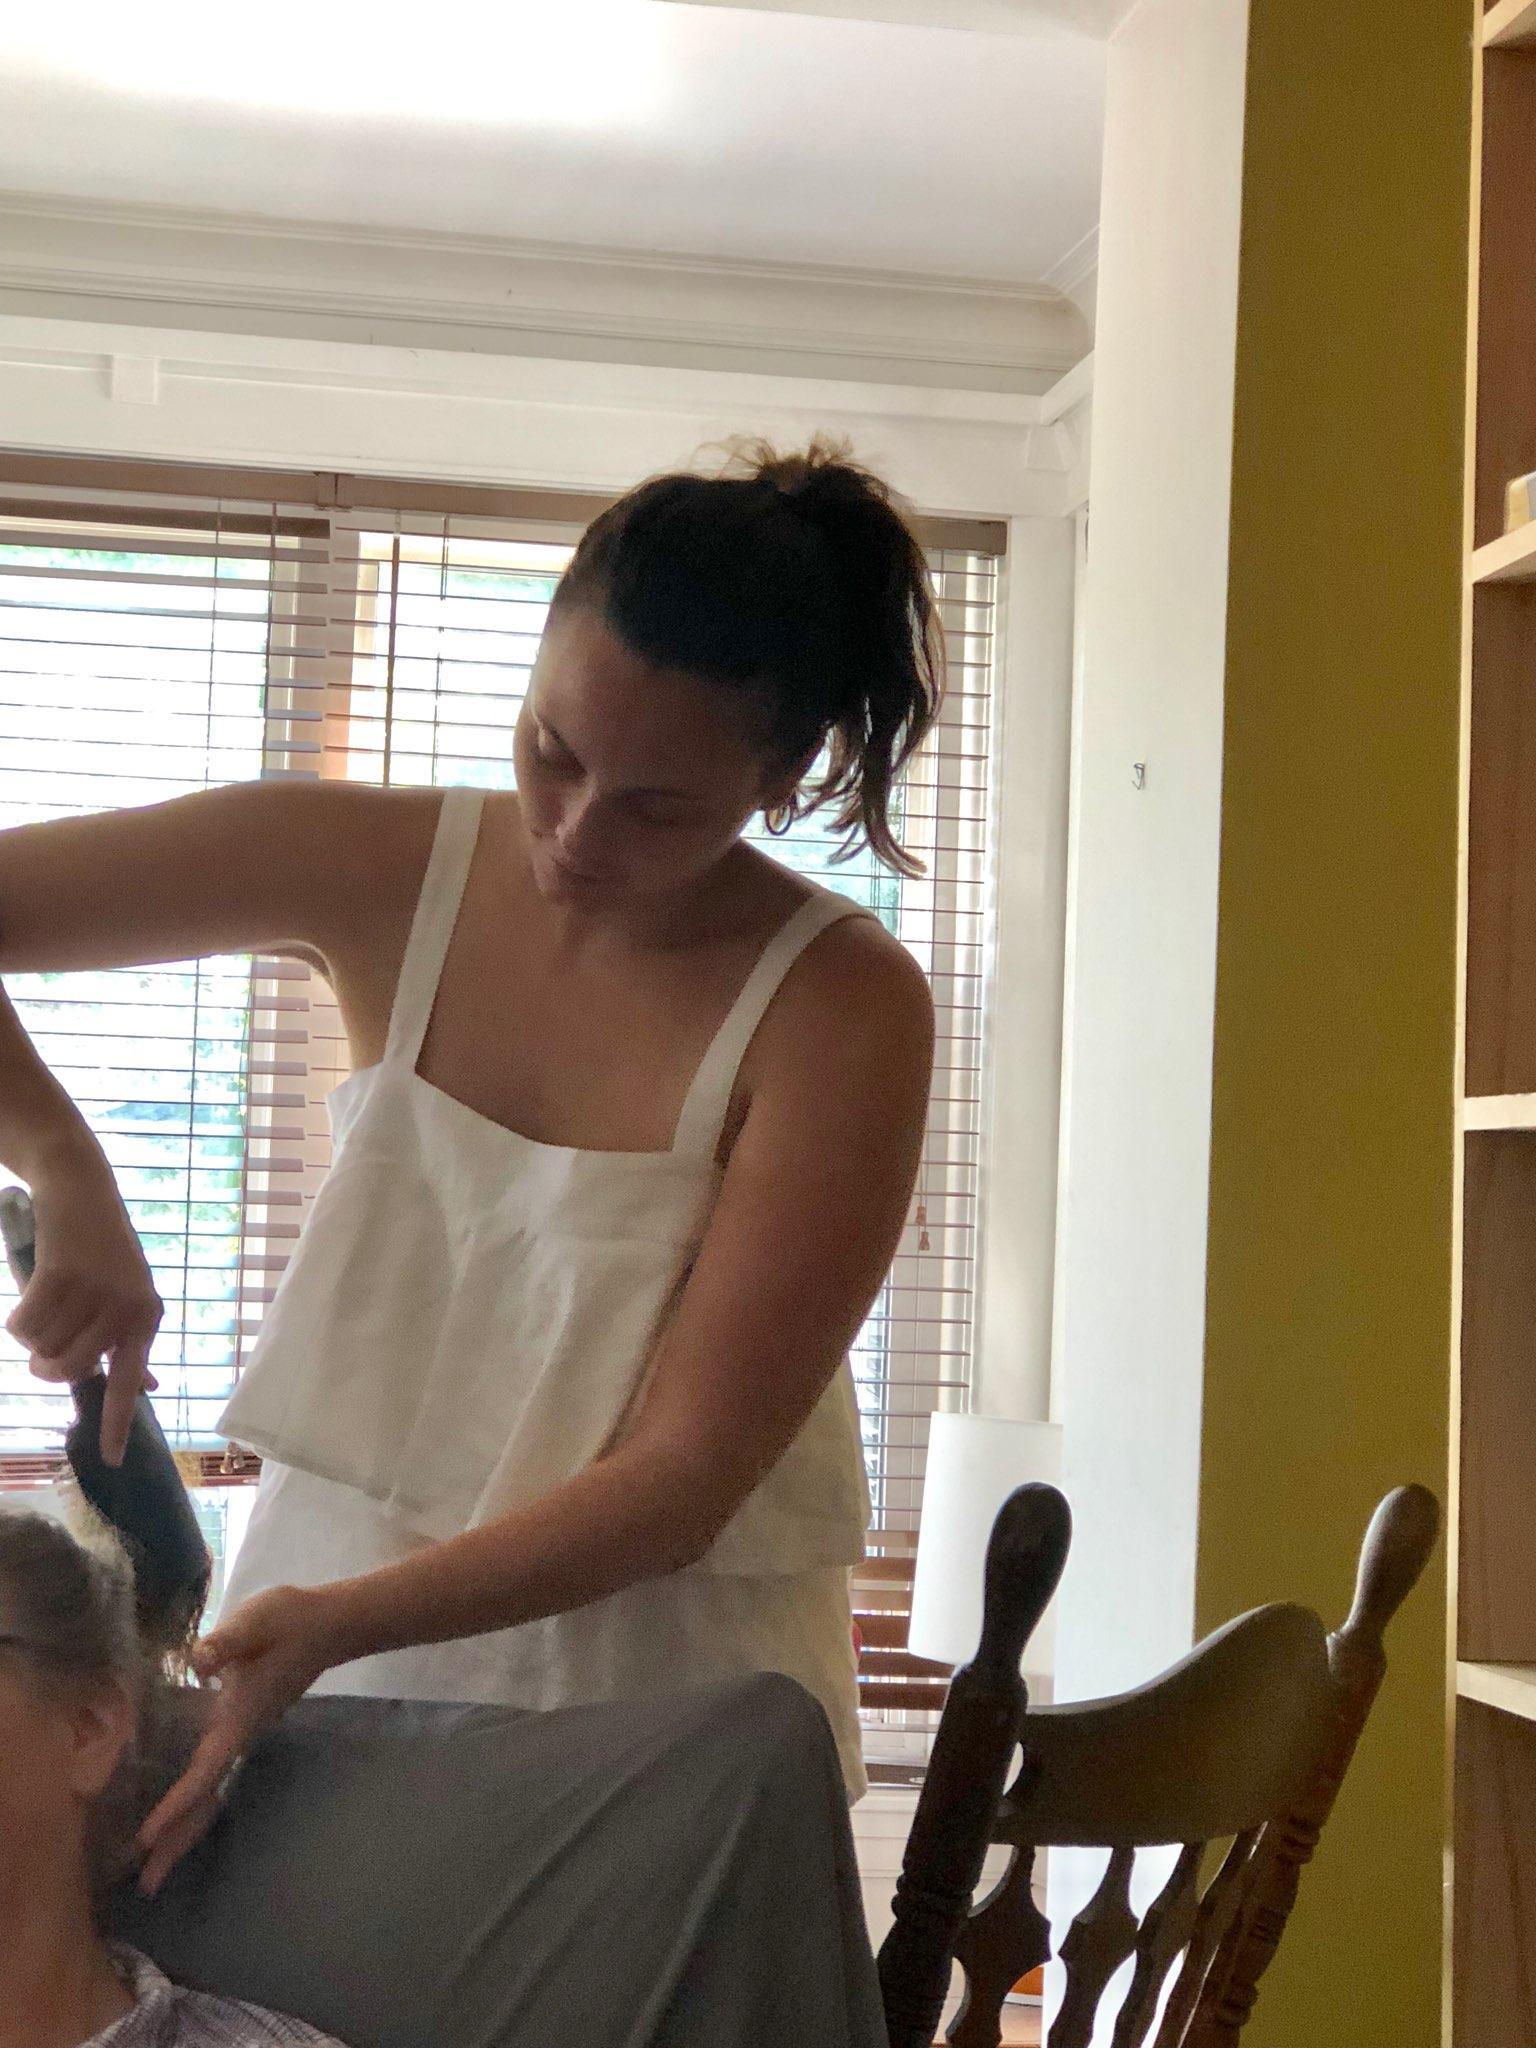 My niece Natalia braiding my hair.